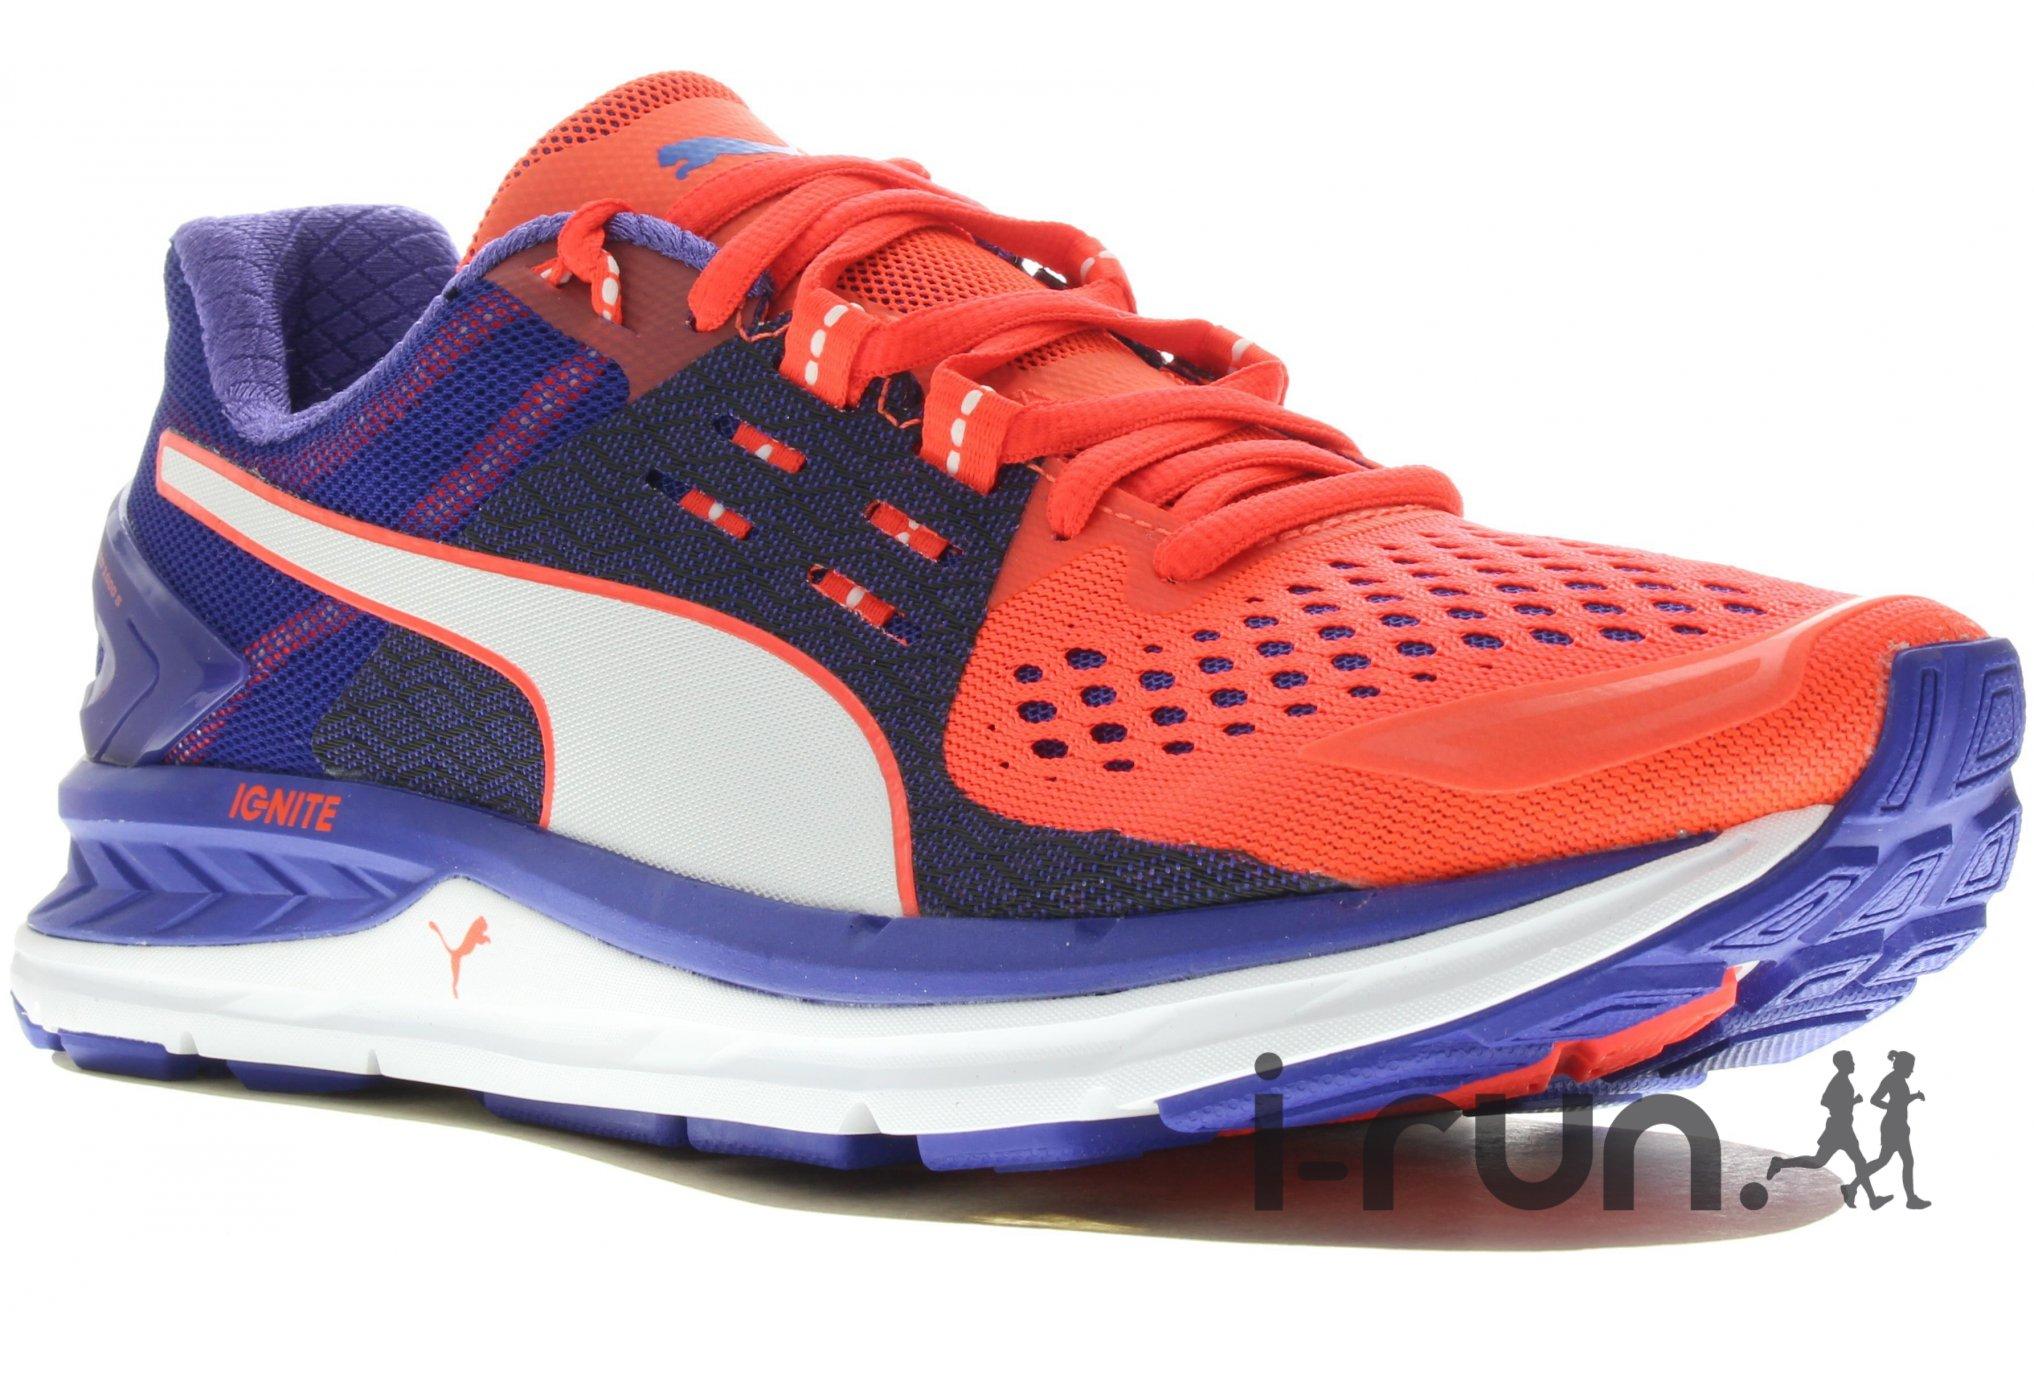 Resathlon Puma Speed 1000 S Ignite W Chaussures running femme